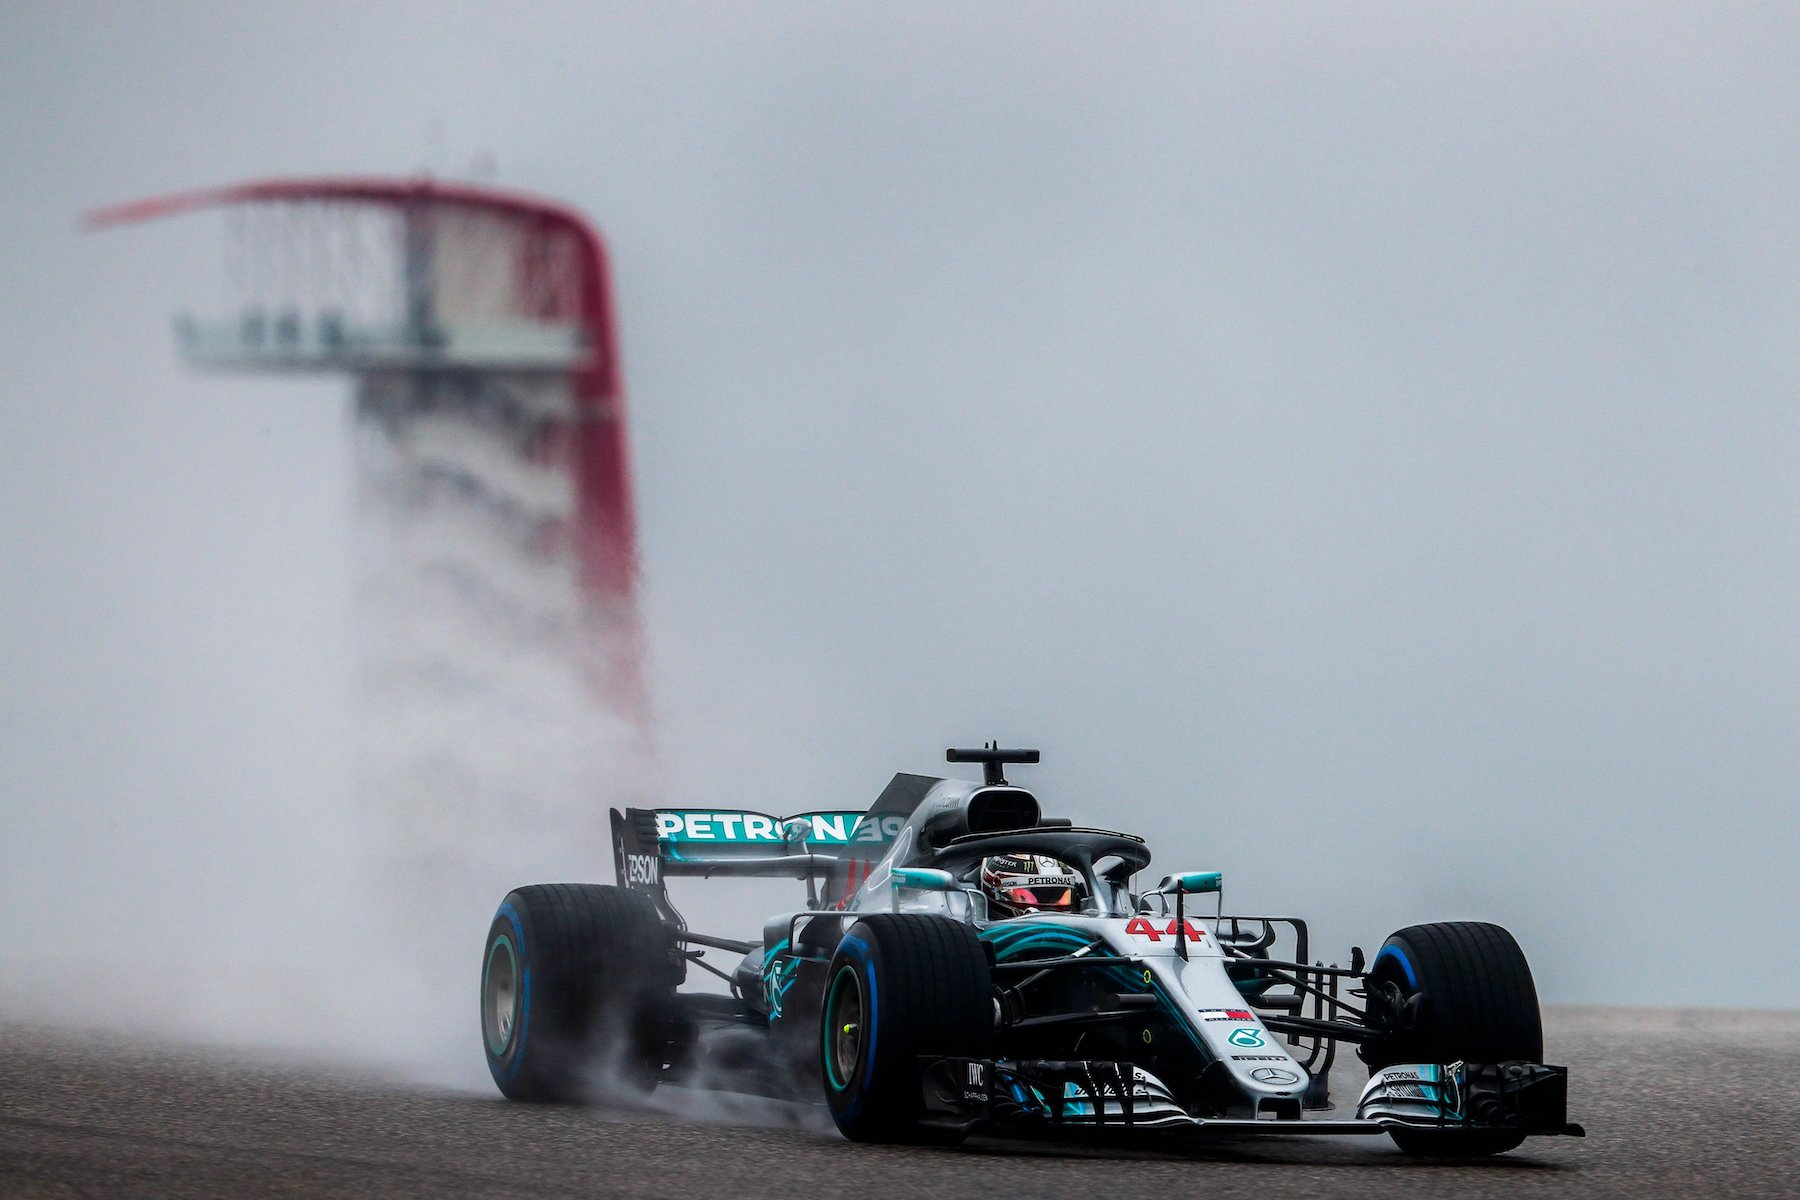 4 2018 Lewis Hamilton | Mercedes W09 | 2018 USGP FP1 3 copy.jpg